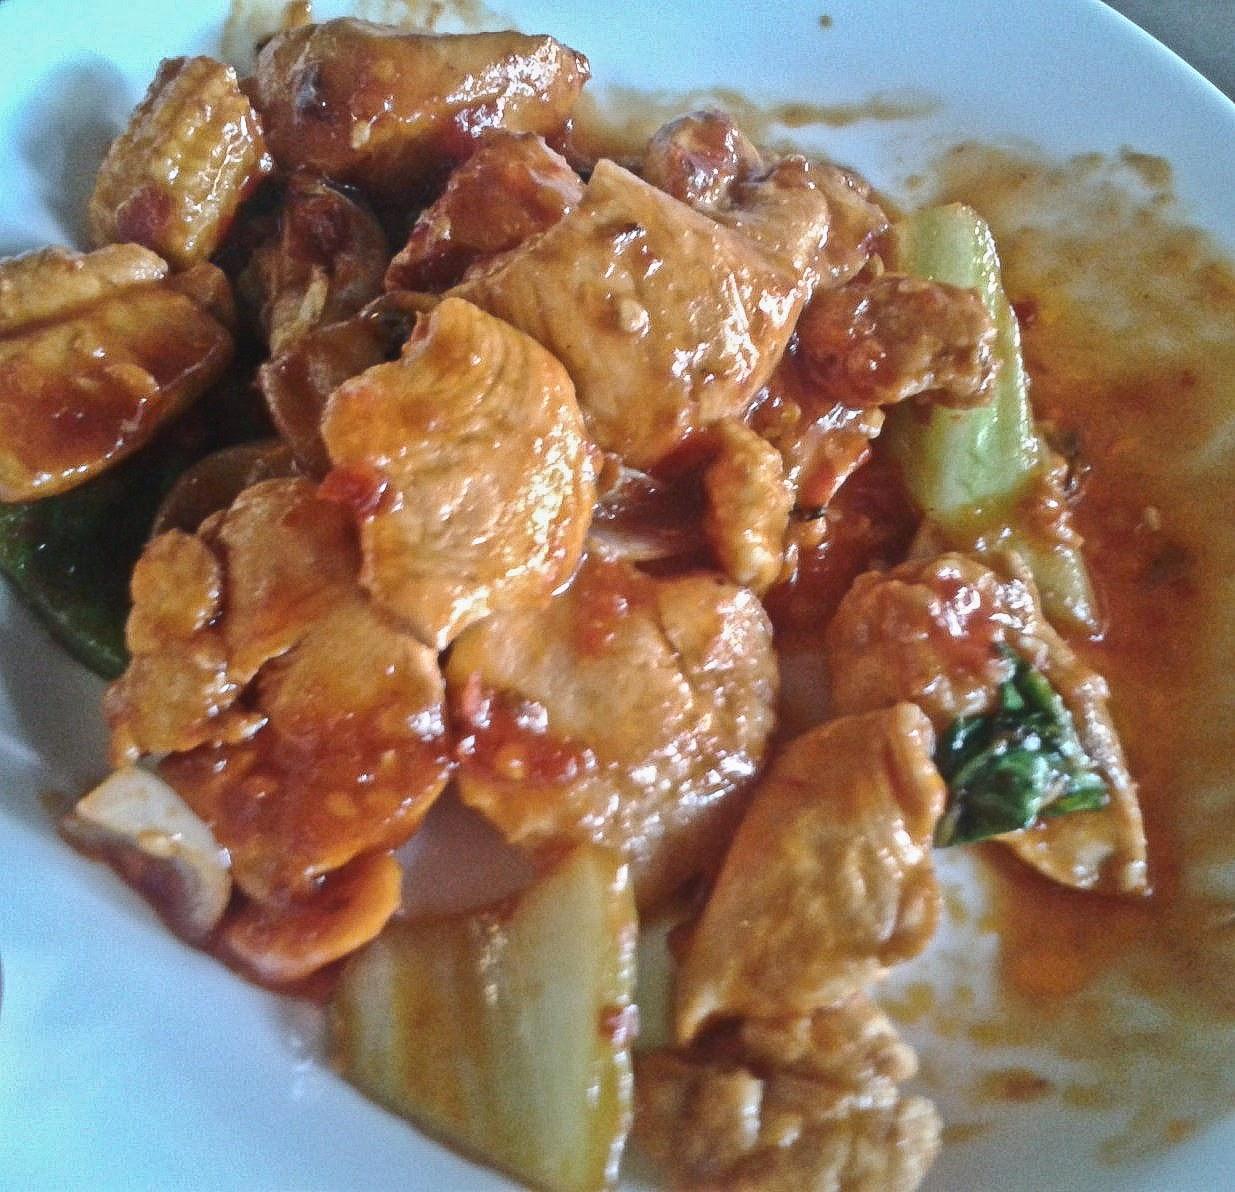 ... soy sauce stir fried noodles chili soy sauce dip chicken stir fry